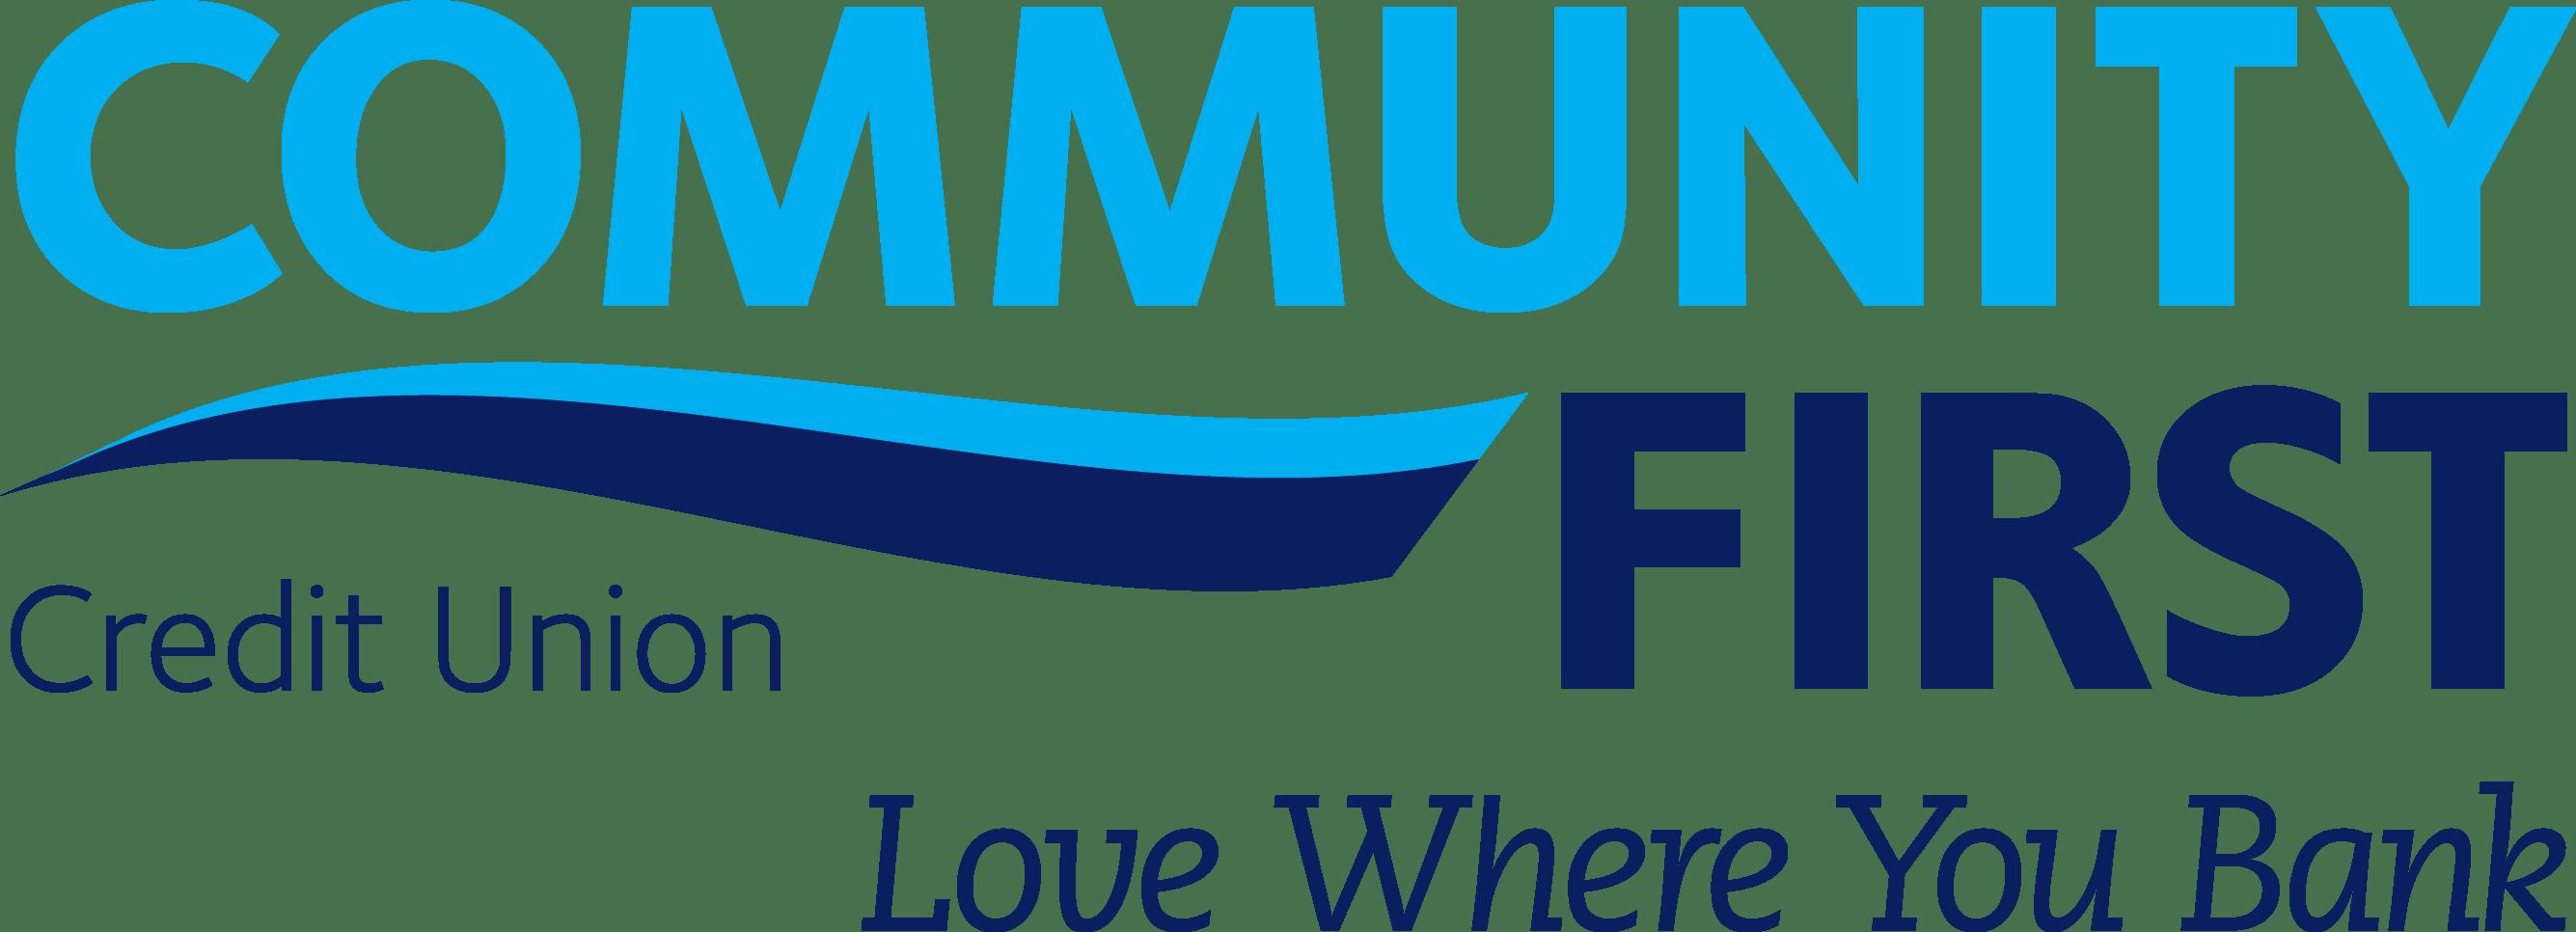 community fcu logo